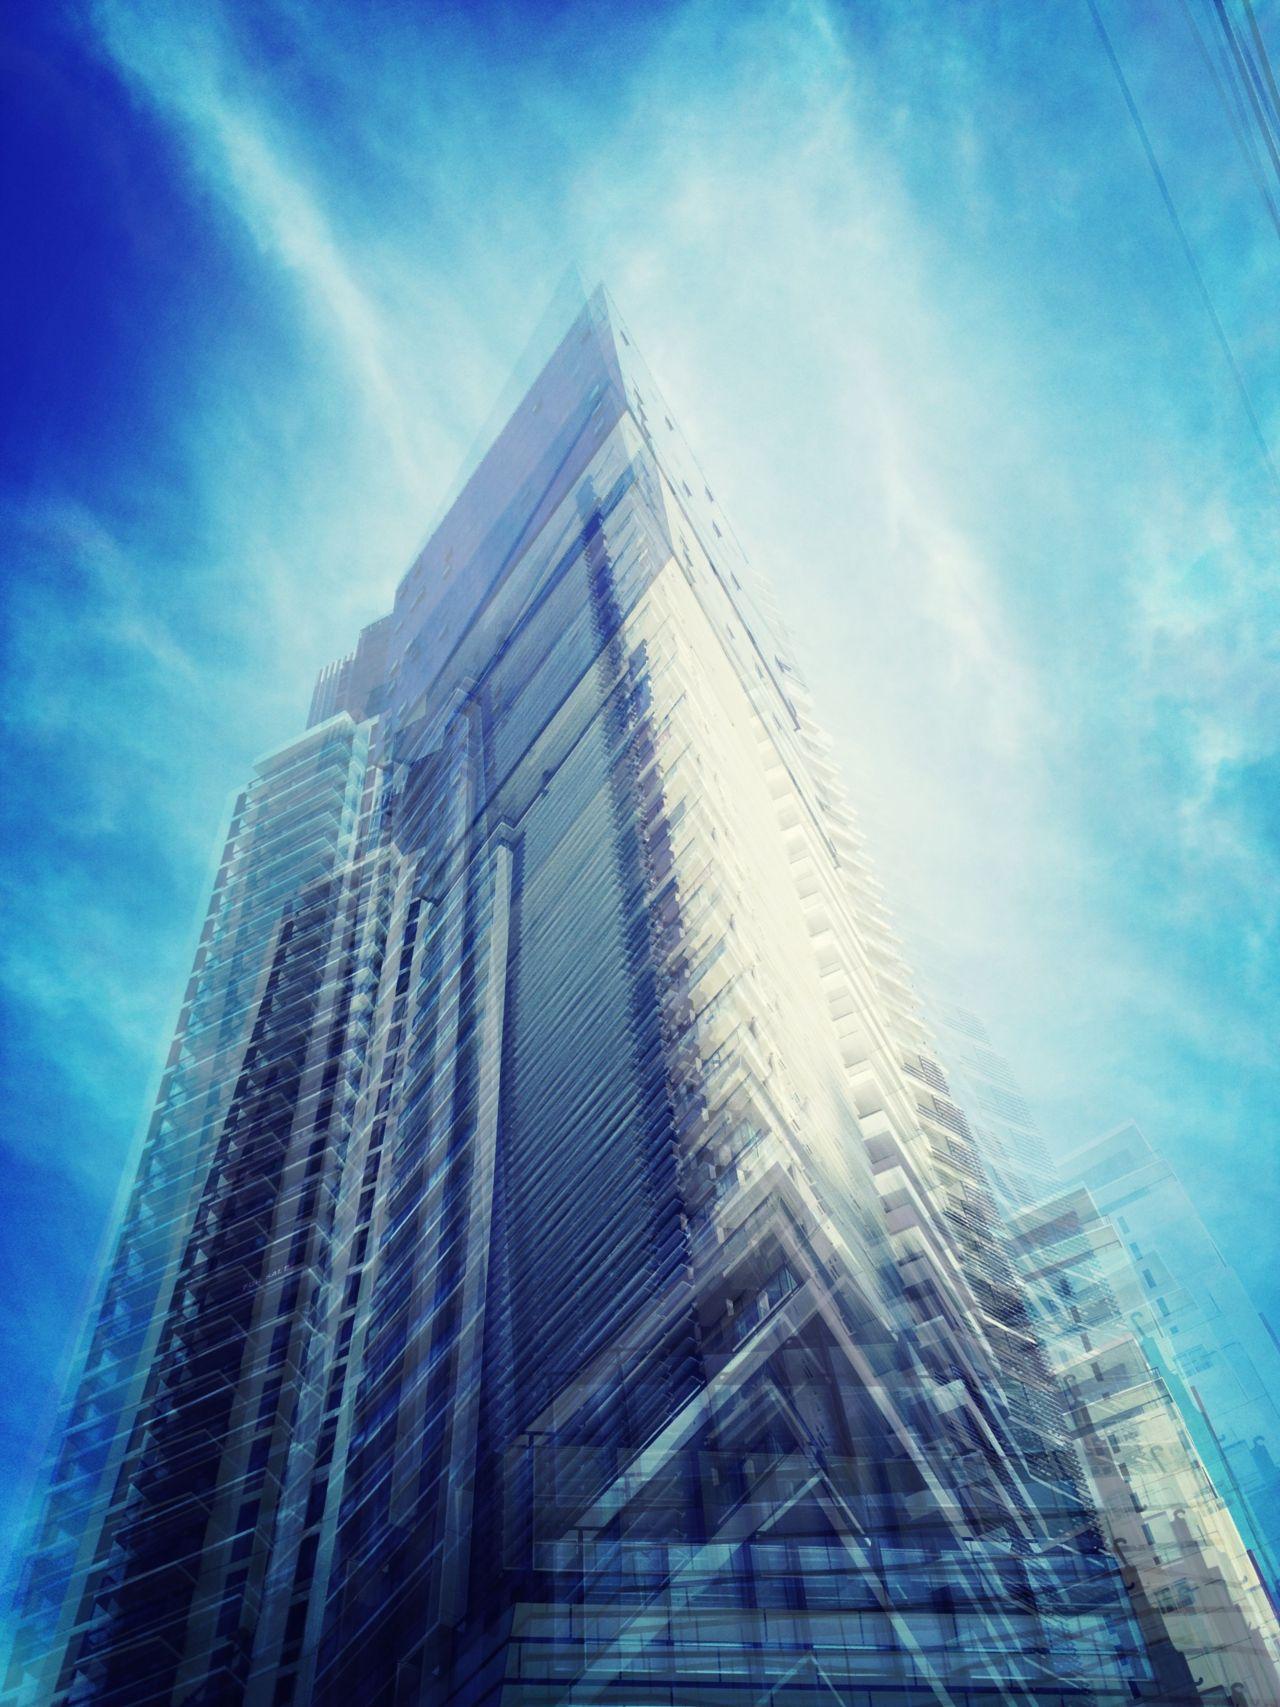 #mobilephotography #vertigo #architecture